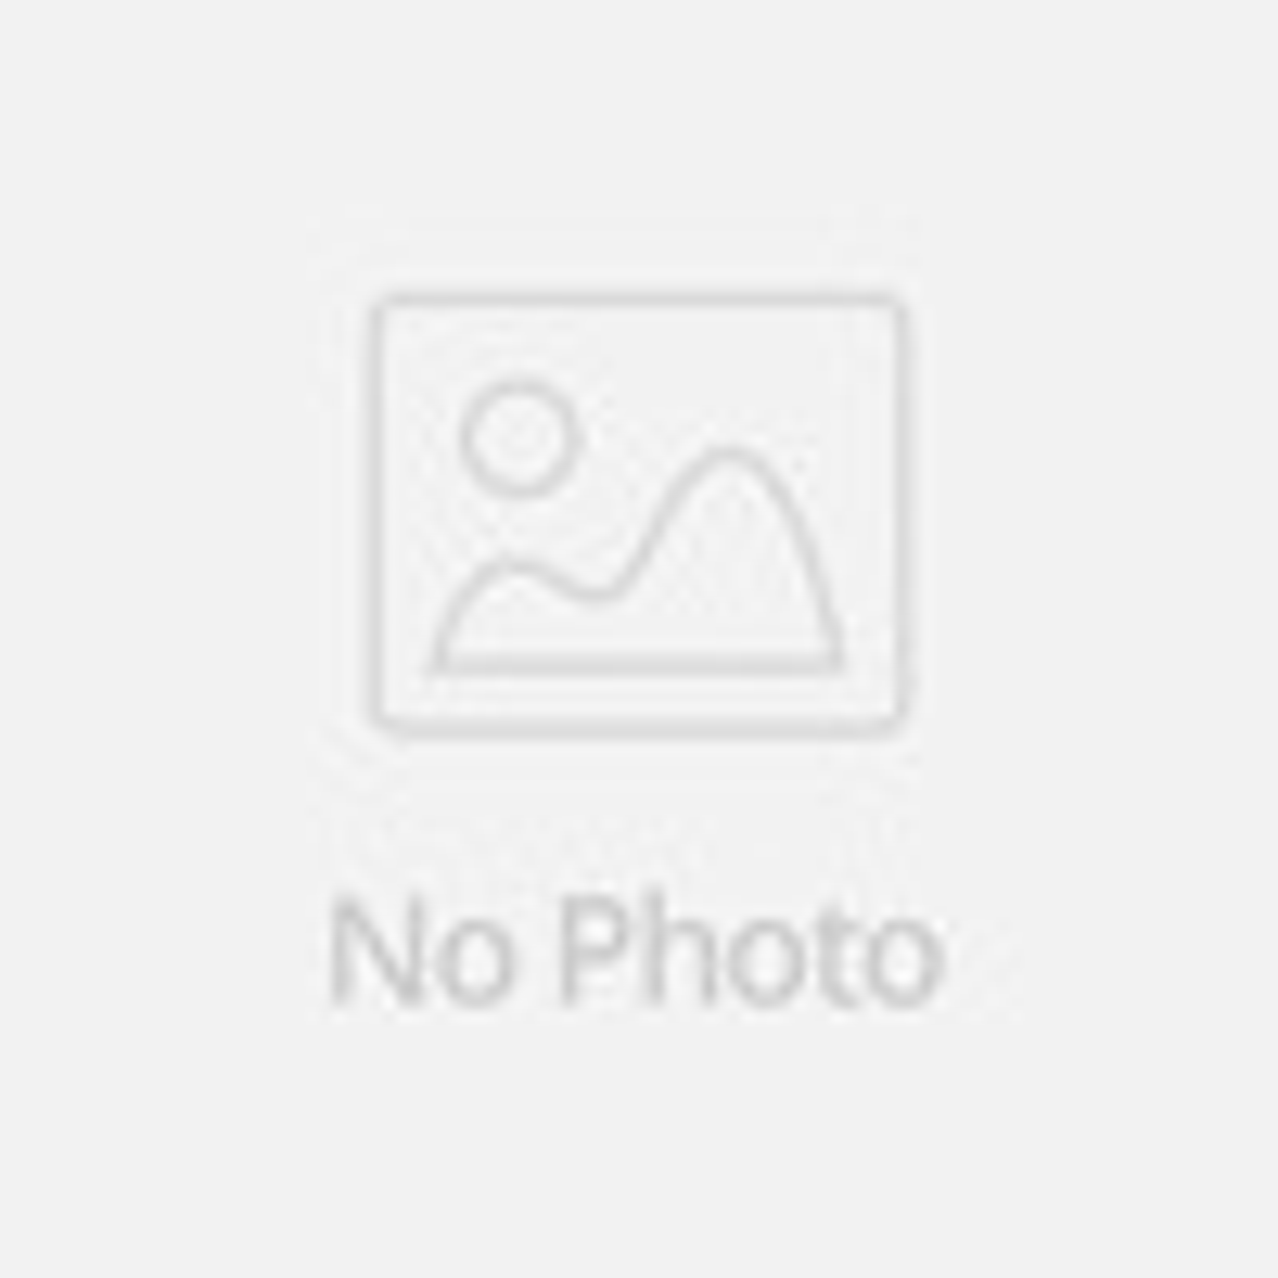 Iron frame bathroom mirror decoration mirror rattan mirror(China (Mainland))